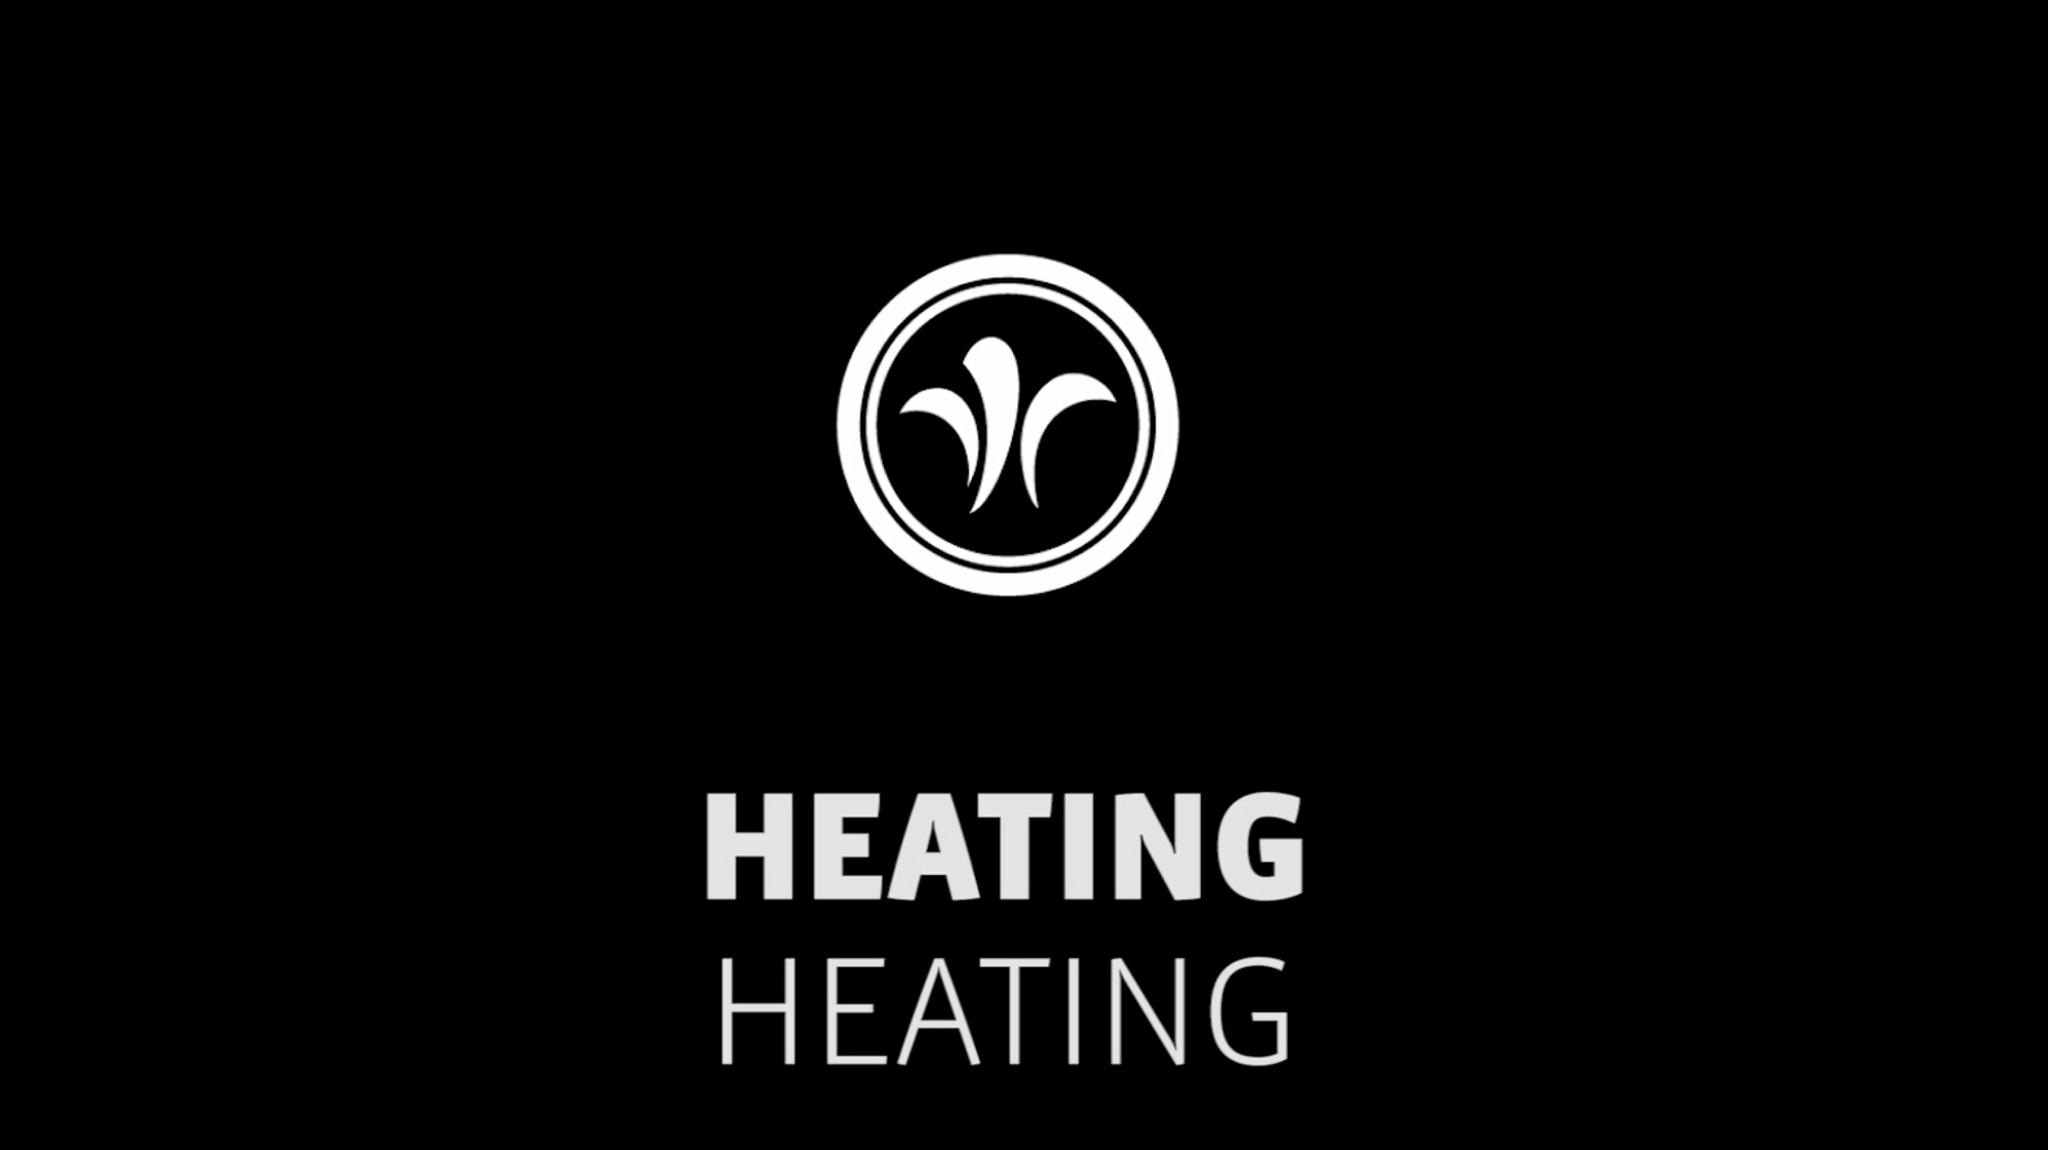 motorhome heater // niesmann+bischoff - camper (model ARTO) // 2019 // H2